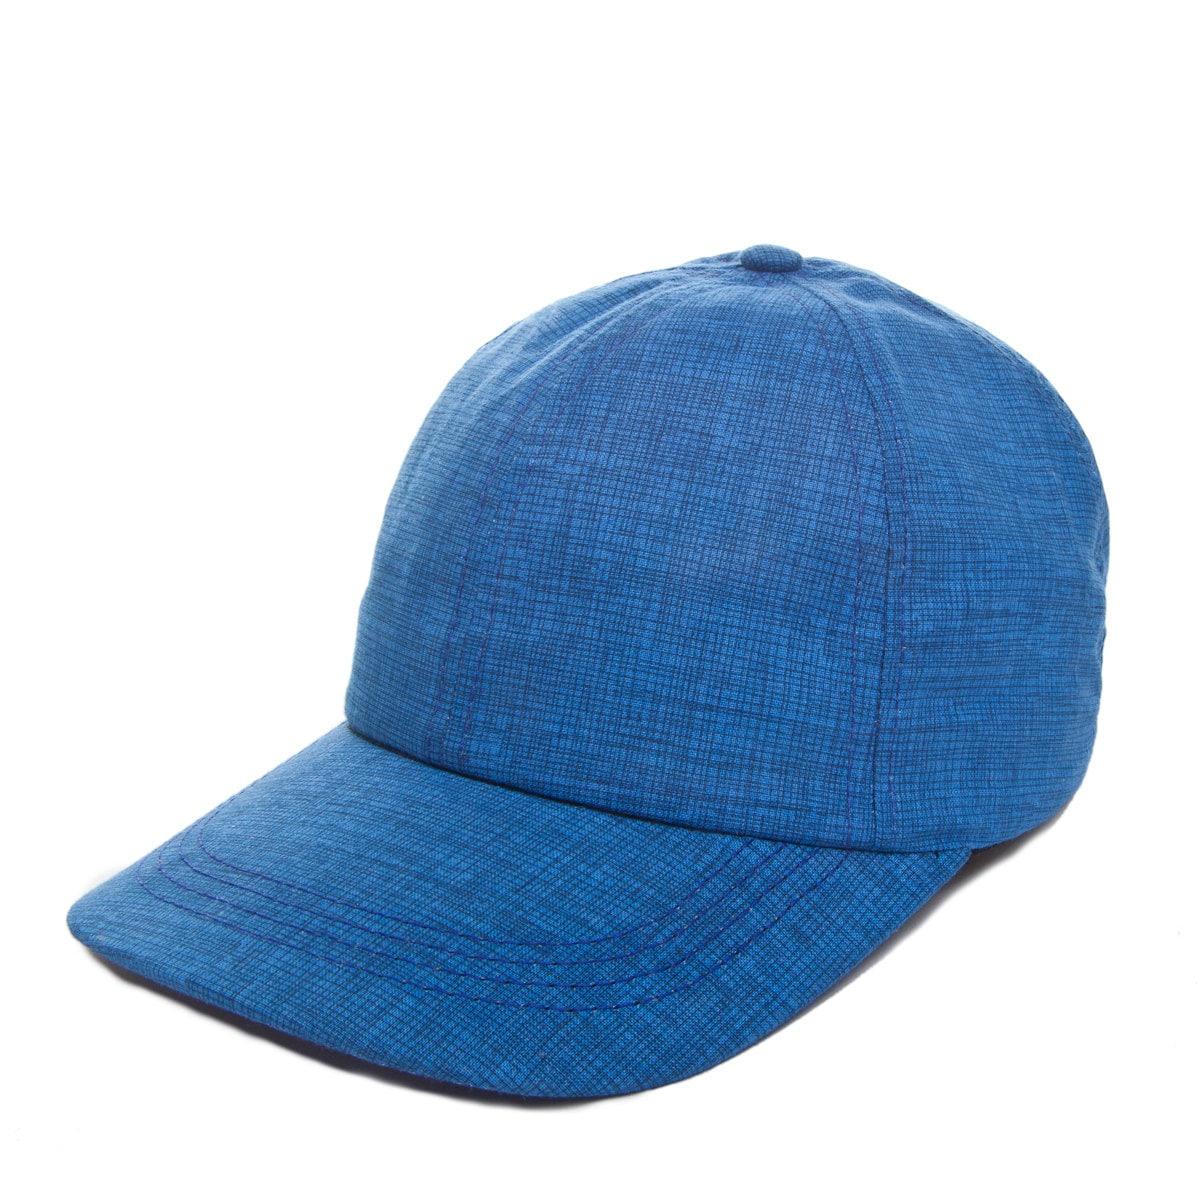 baseball cap for cotton baseball cap blue by